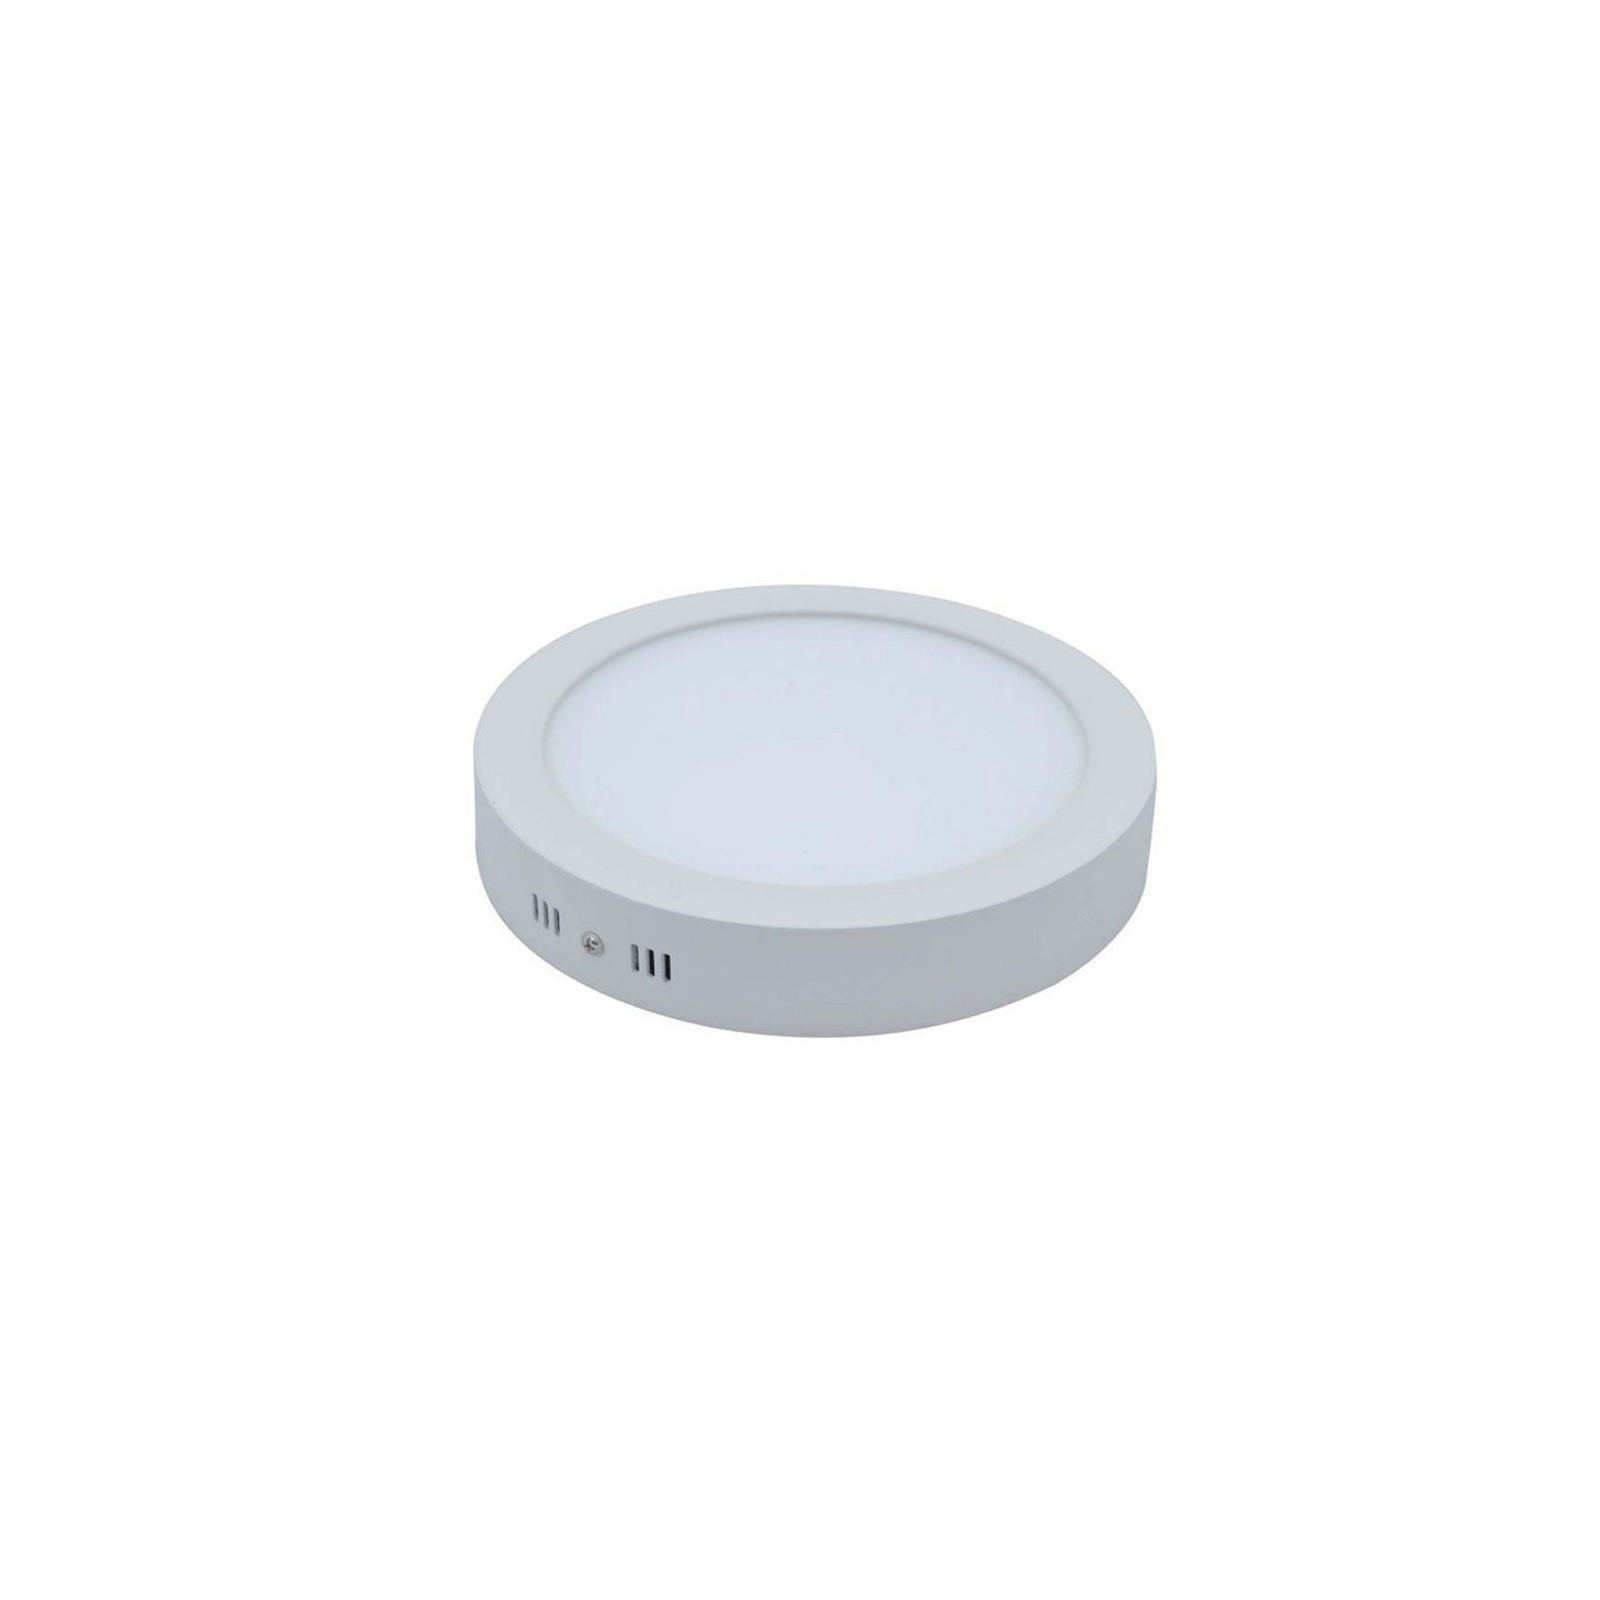 HUBLOT LED 6W ROND BLANC CHAUD INTERIEUR IP20